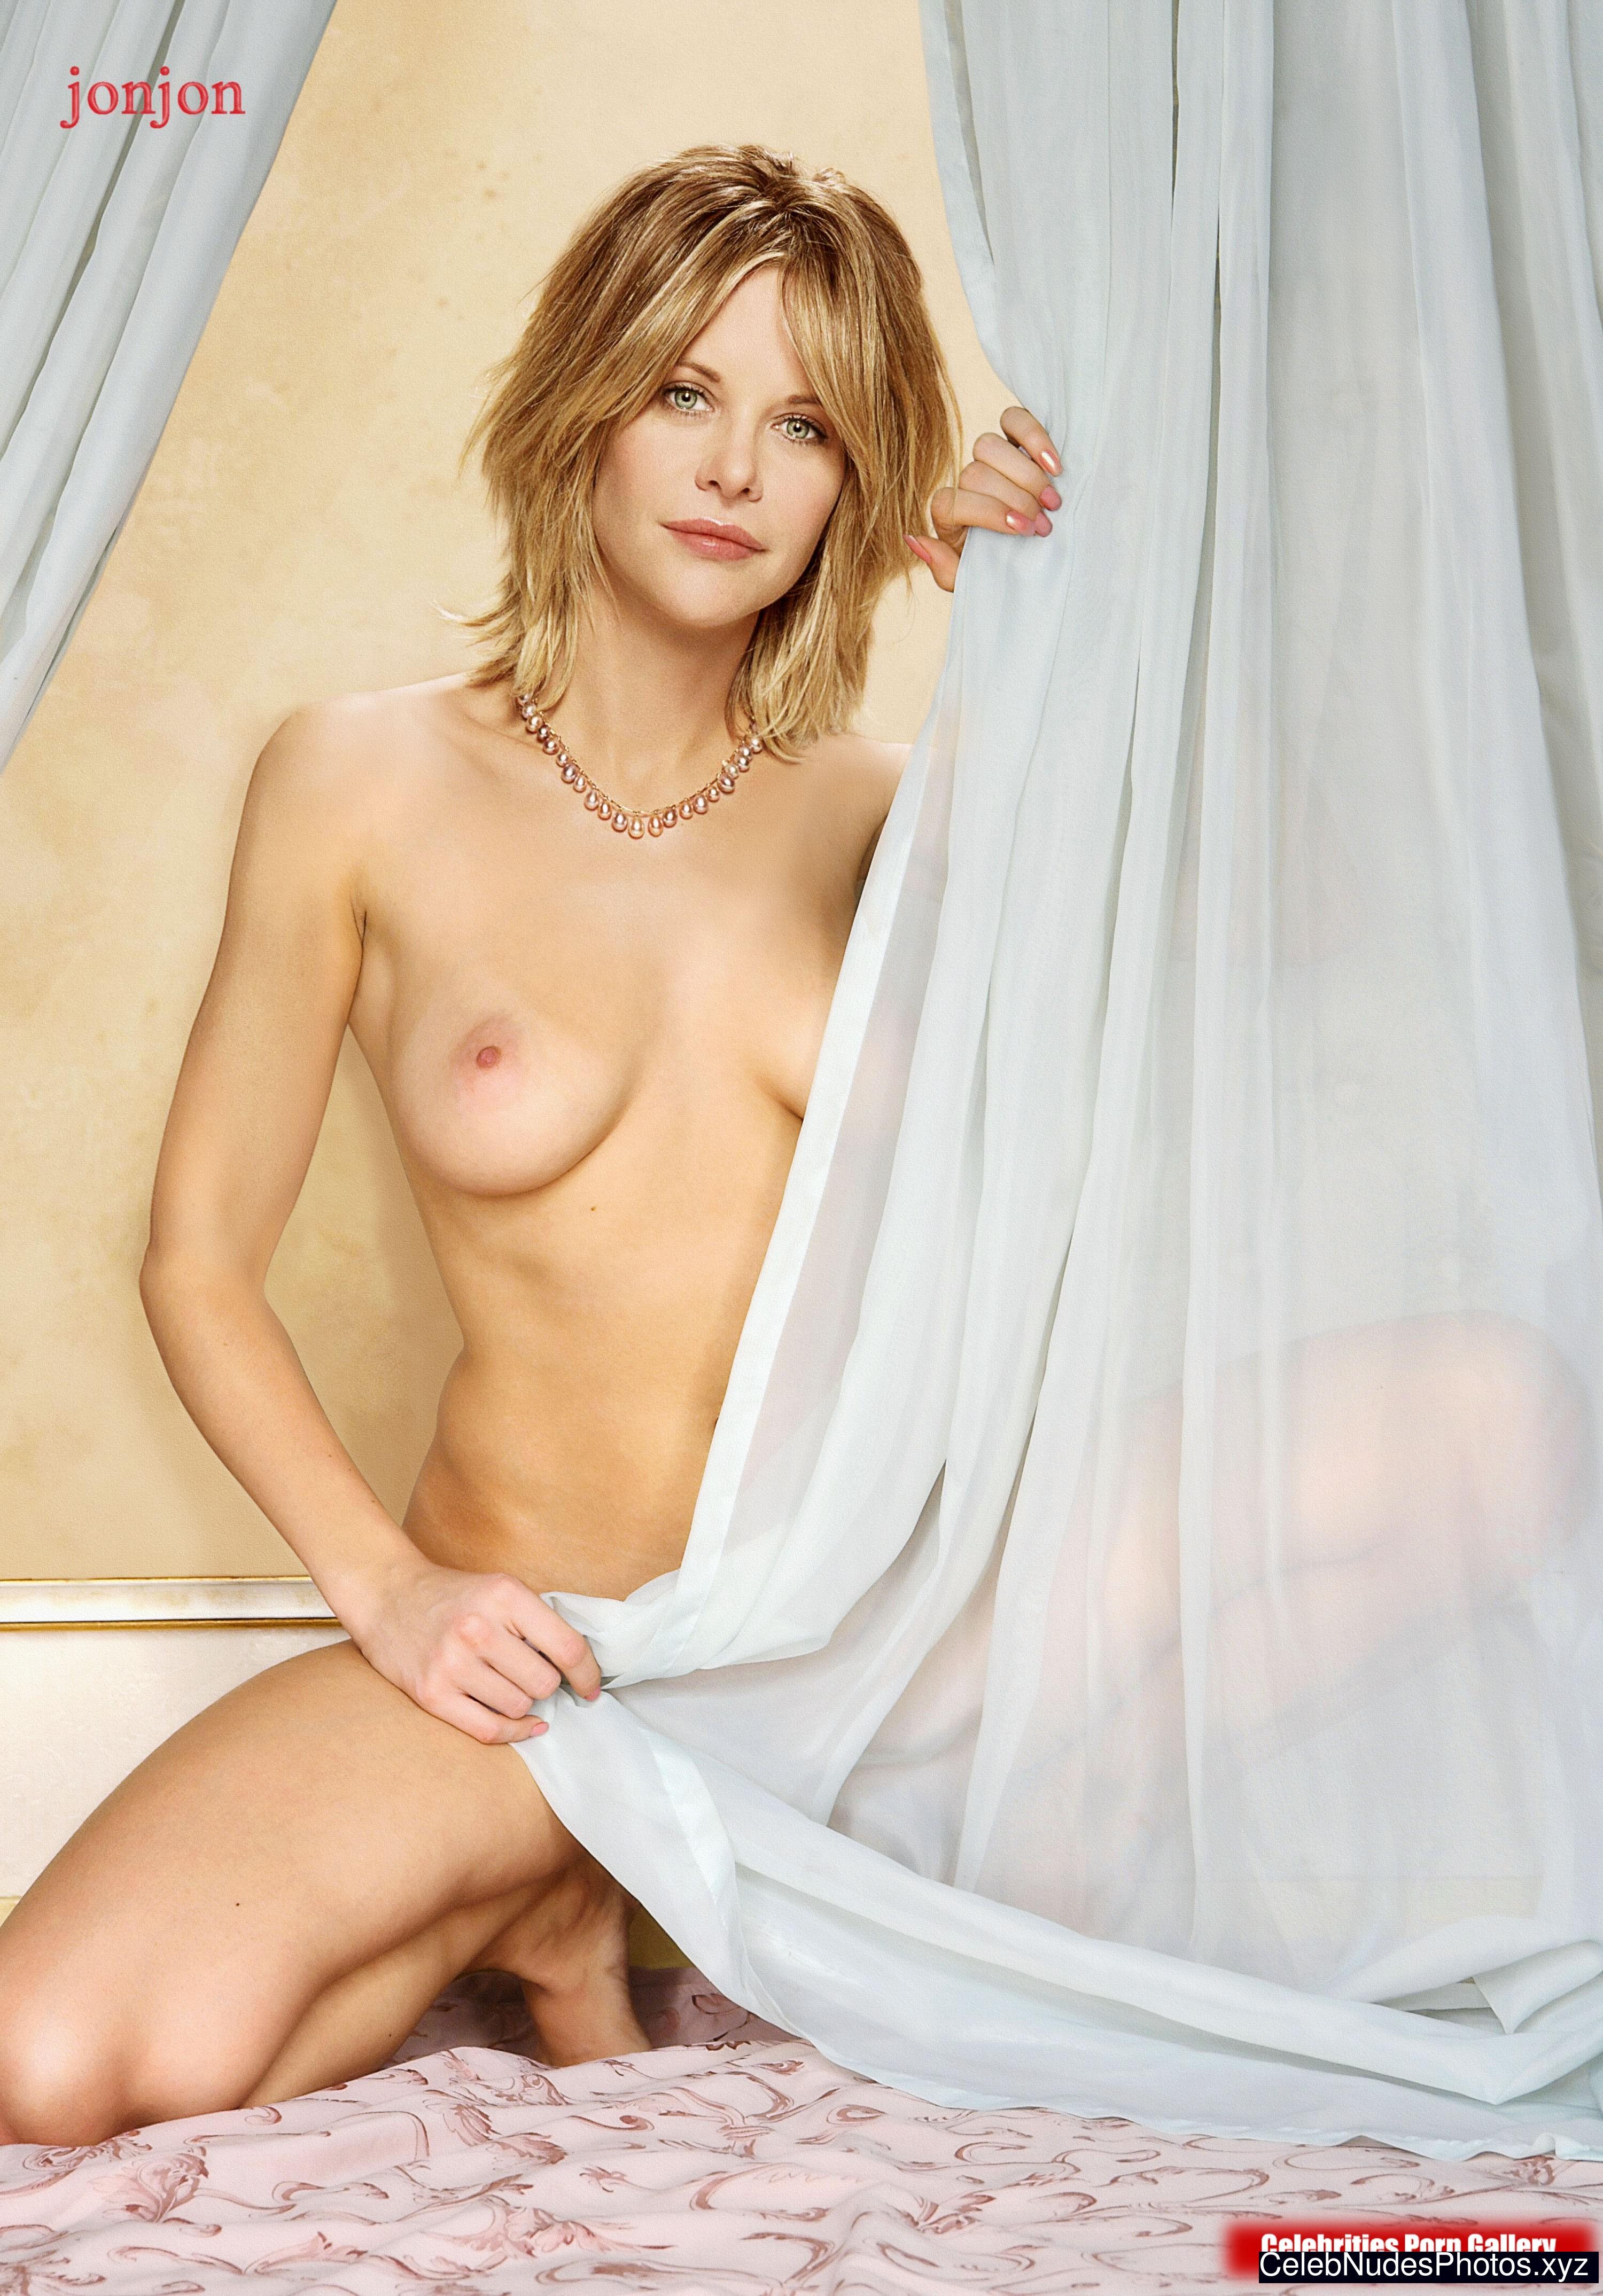 Sexy lauren gottlieb sexy nude photos